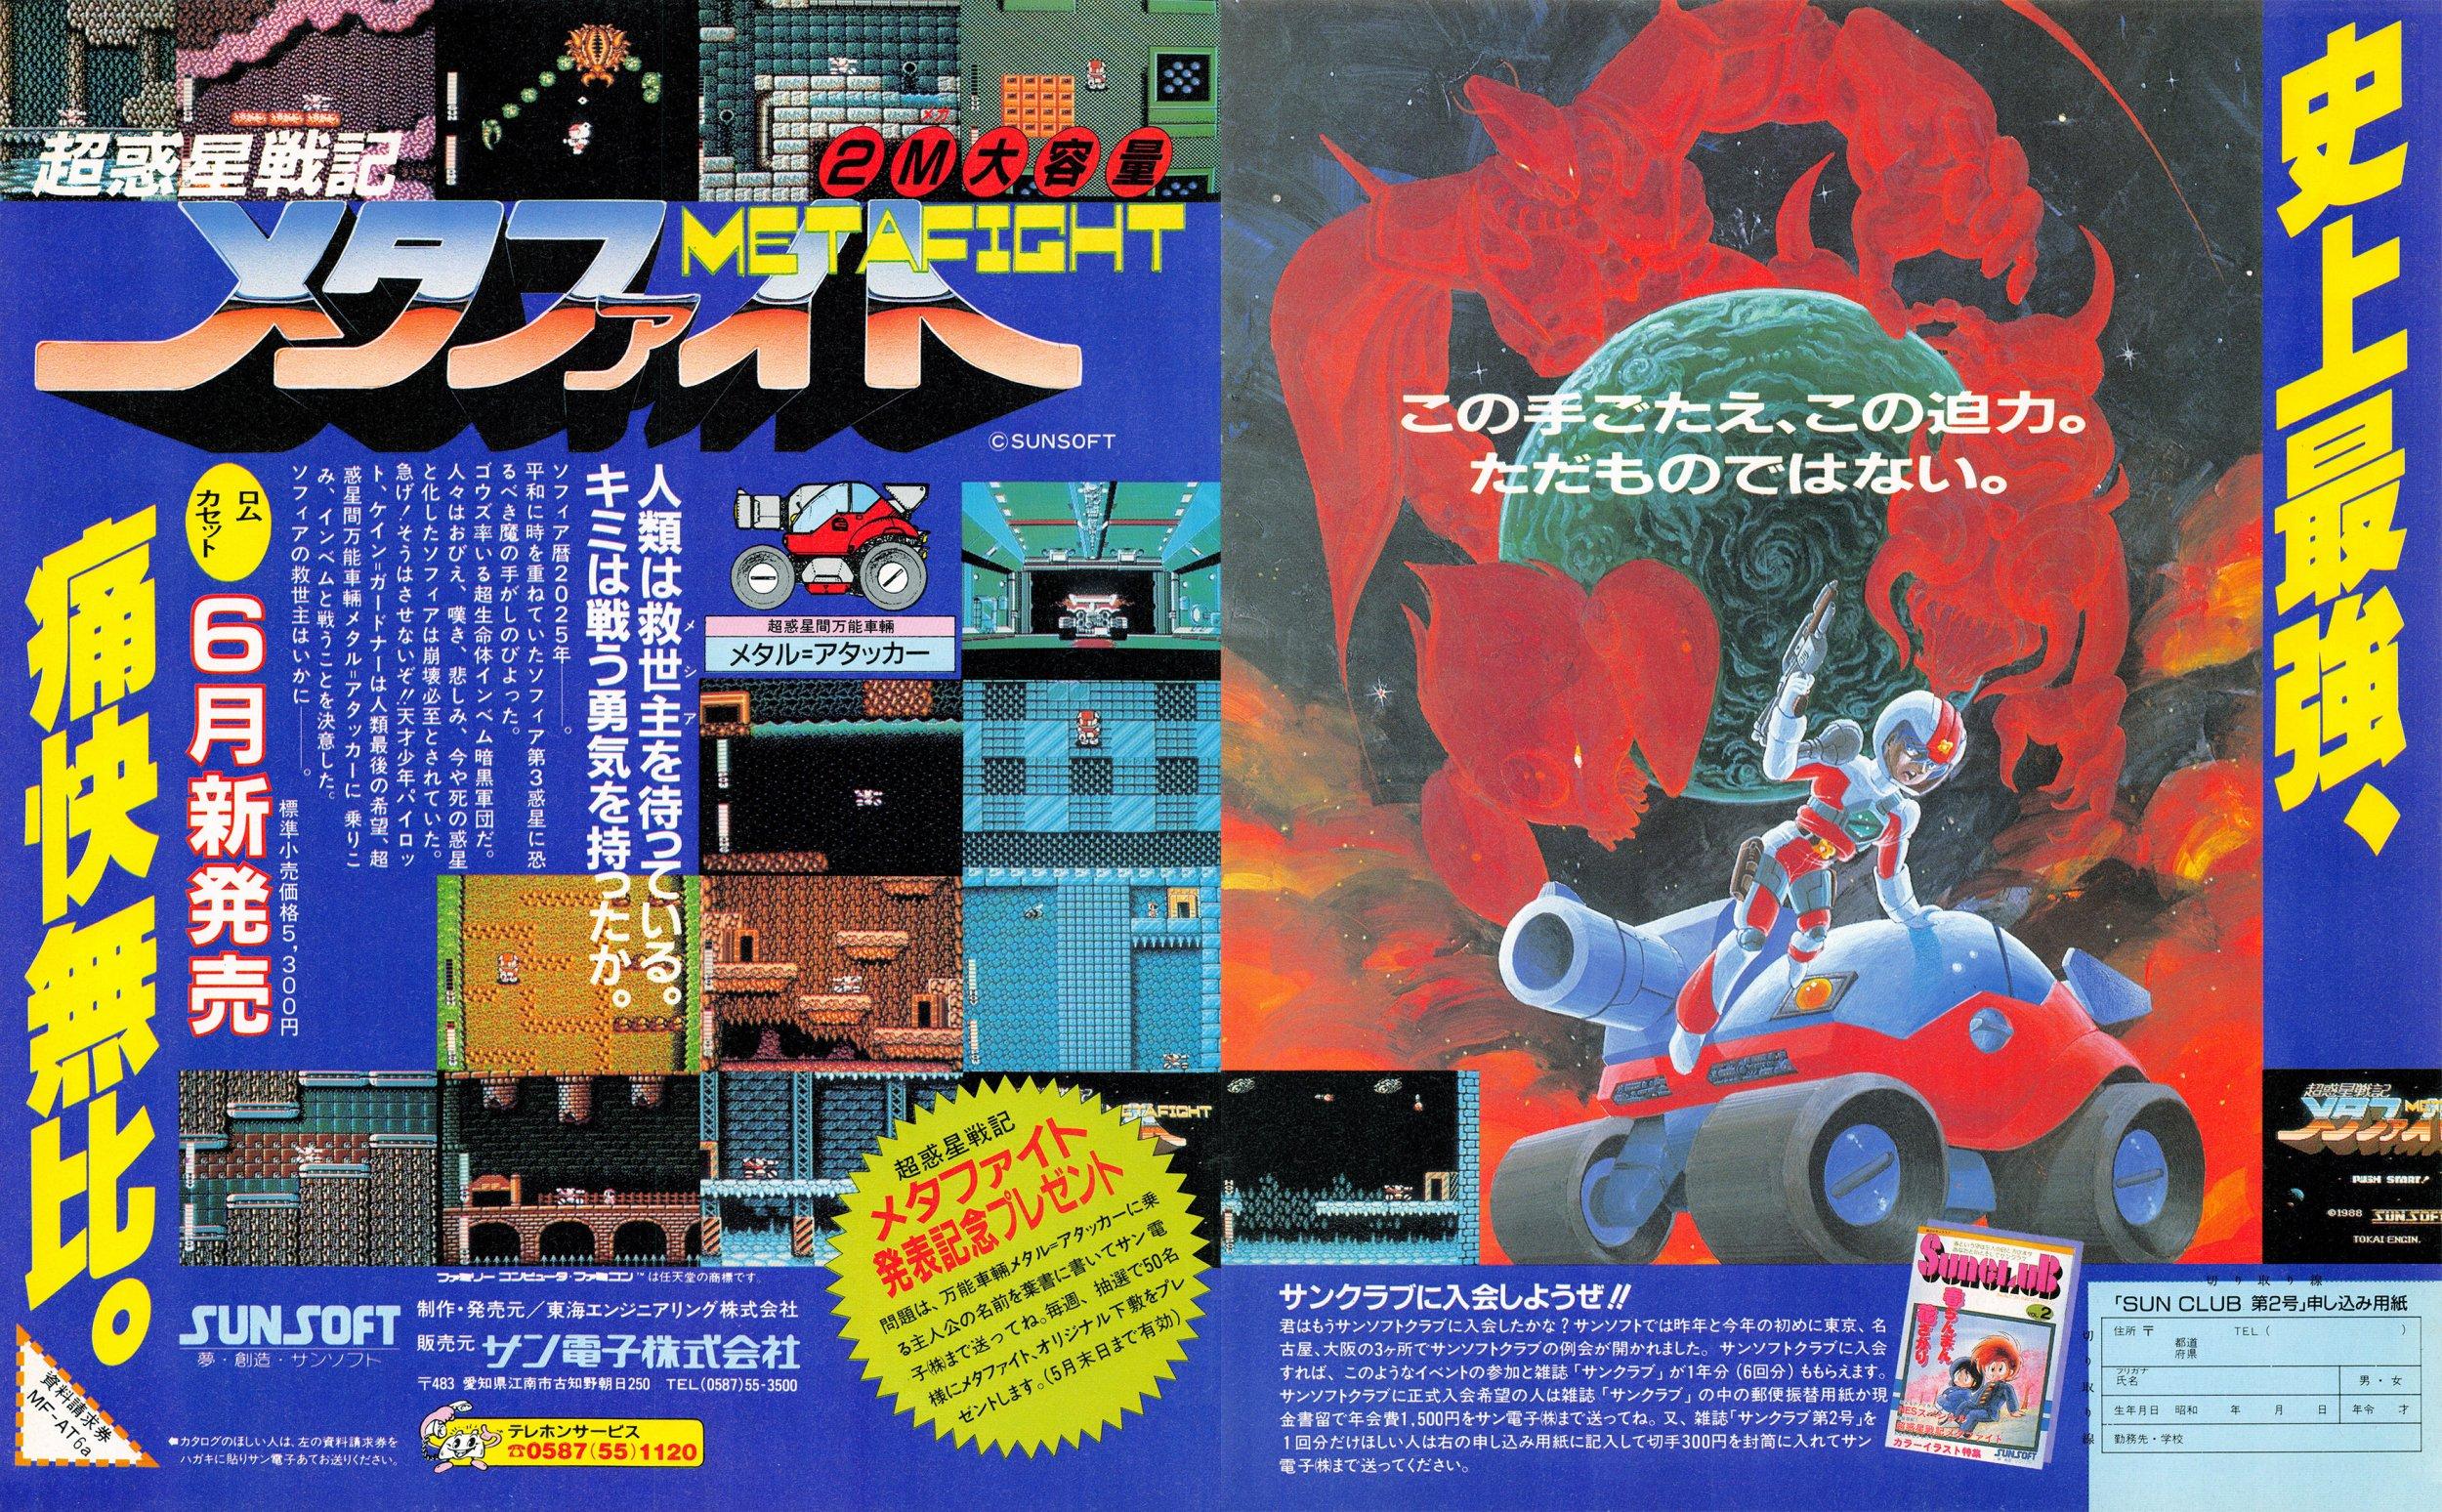 Blaster Master (Chouwakuseisenki Metafight) (Japan)